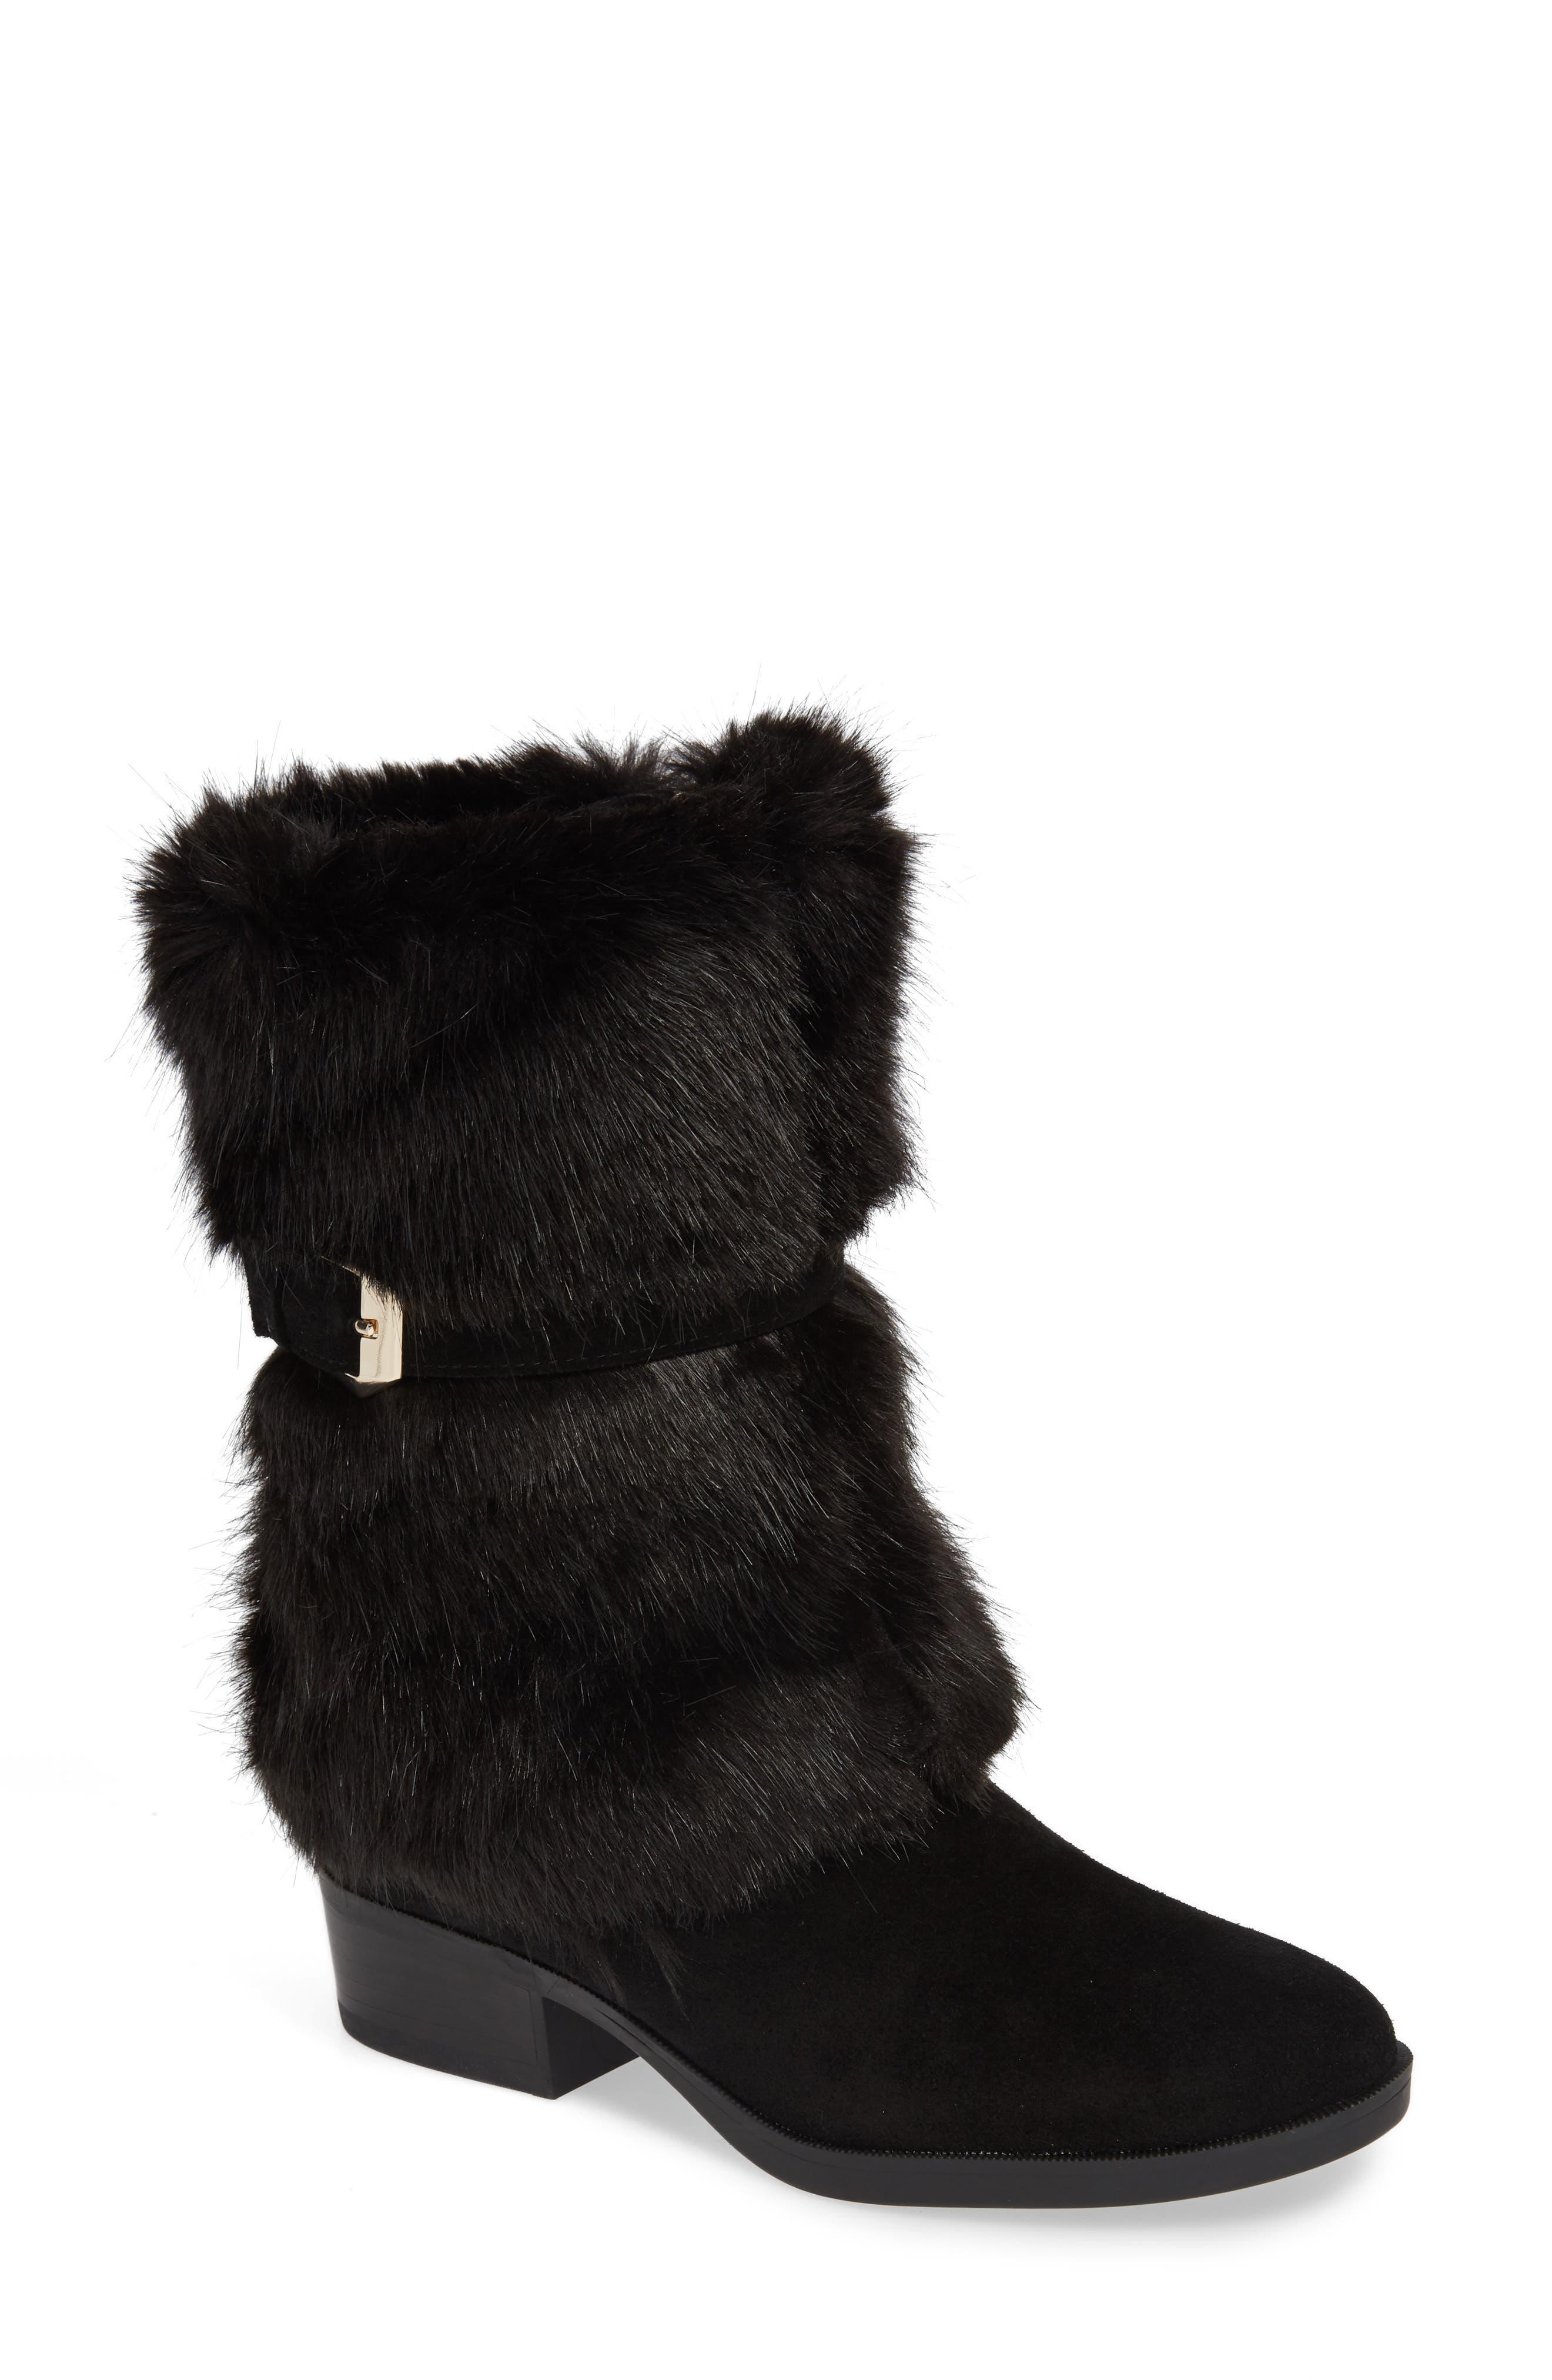 Giselle Water Resistant Faux Fur Boot,                             Main thumbnail 1, color,                             BLACK SUEDE